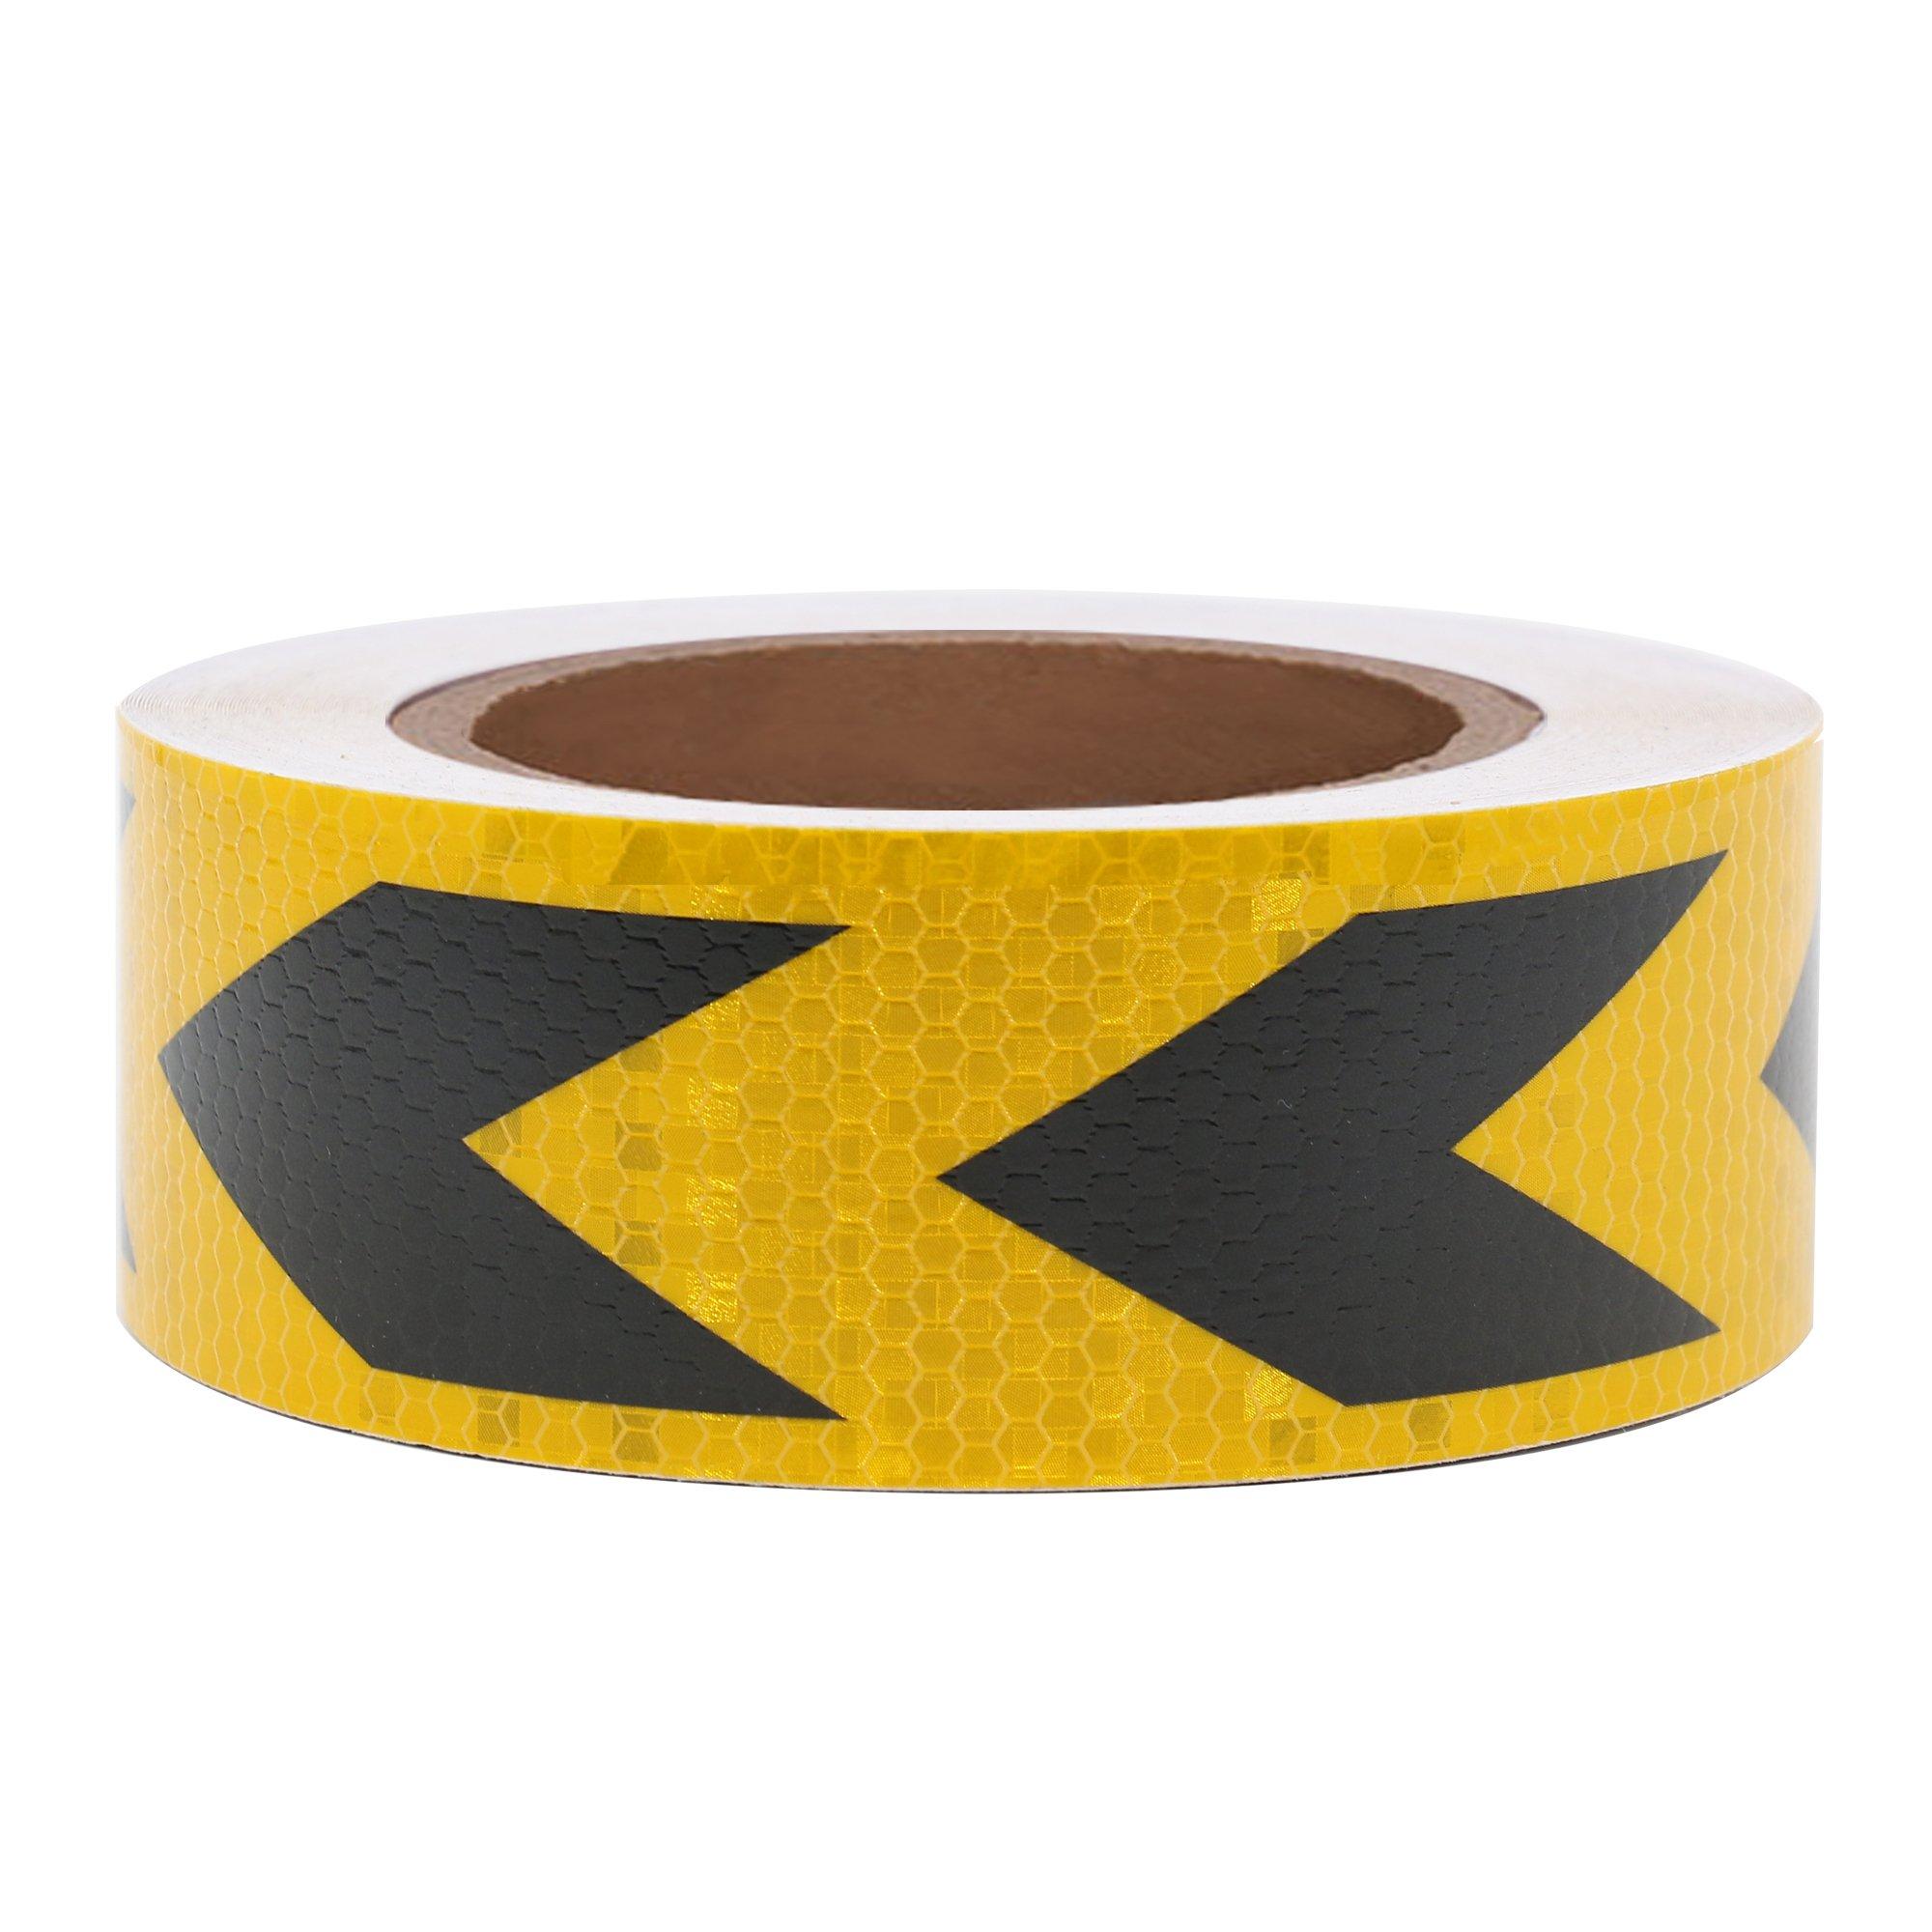 Vehicle Safety Warning Reflective Tape - Yellow